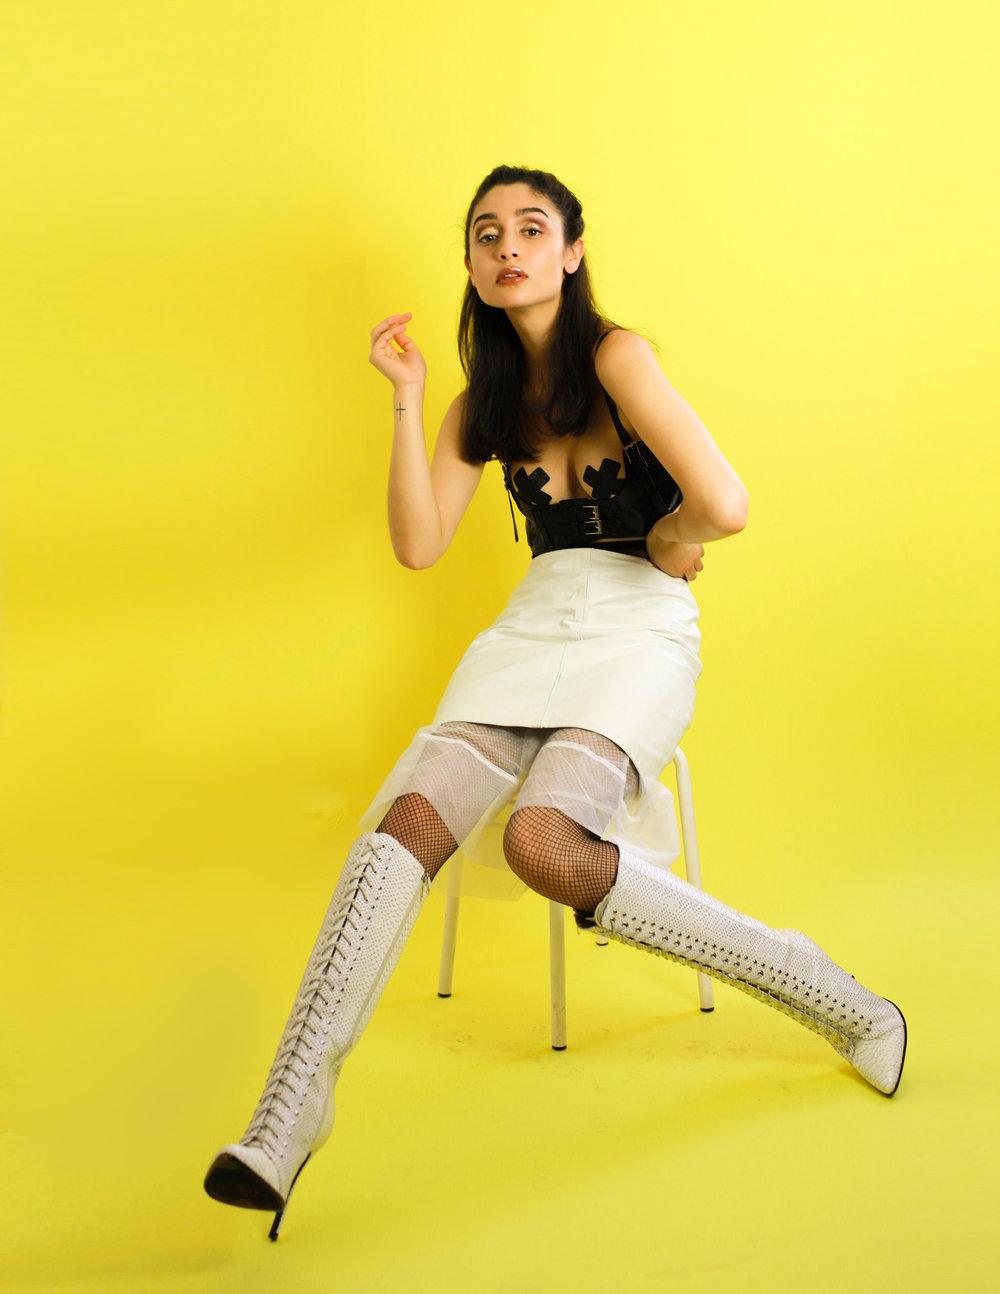 Bra - Seductions  Skirt- Grandeur  Boots - Tejahn